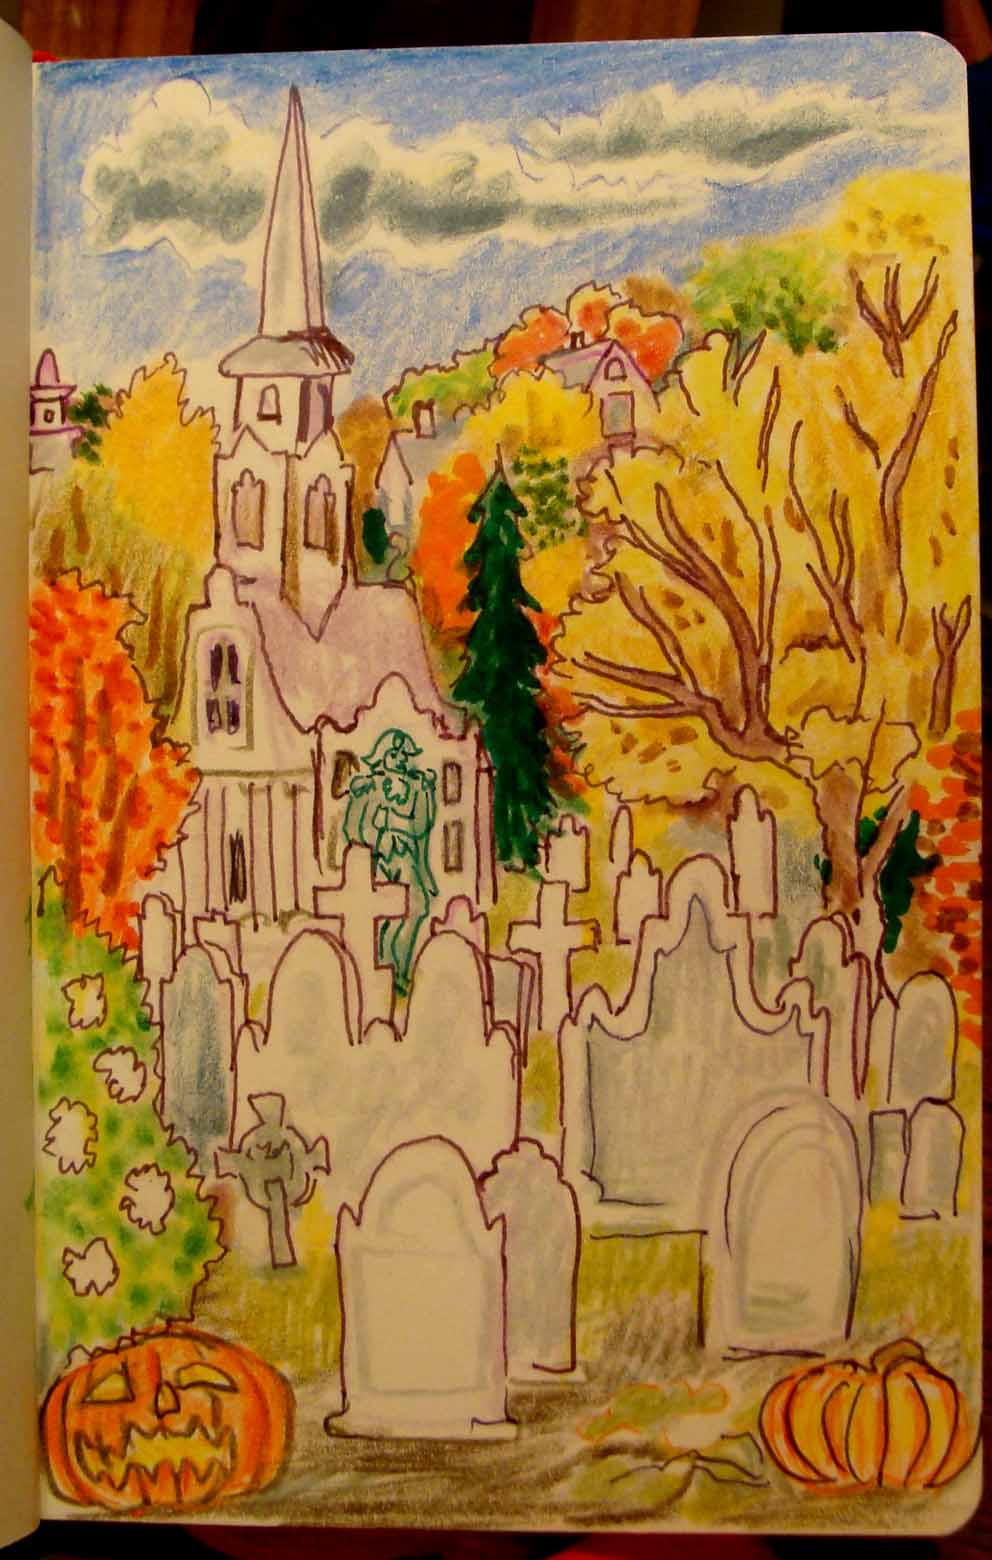 Kingston (Wayne Ferrebee, 2015, color pencil on paper)